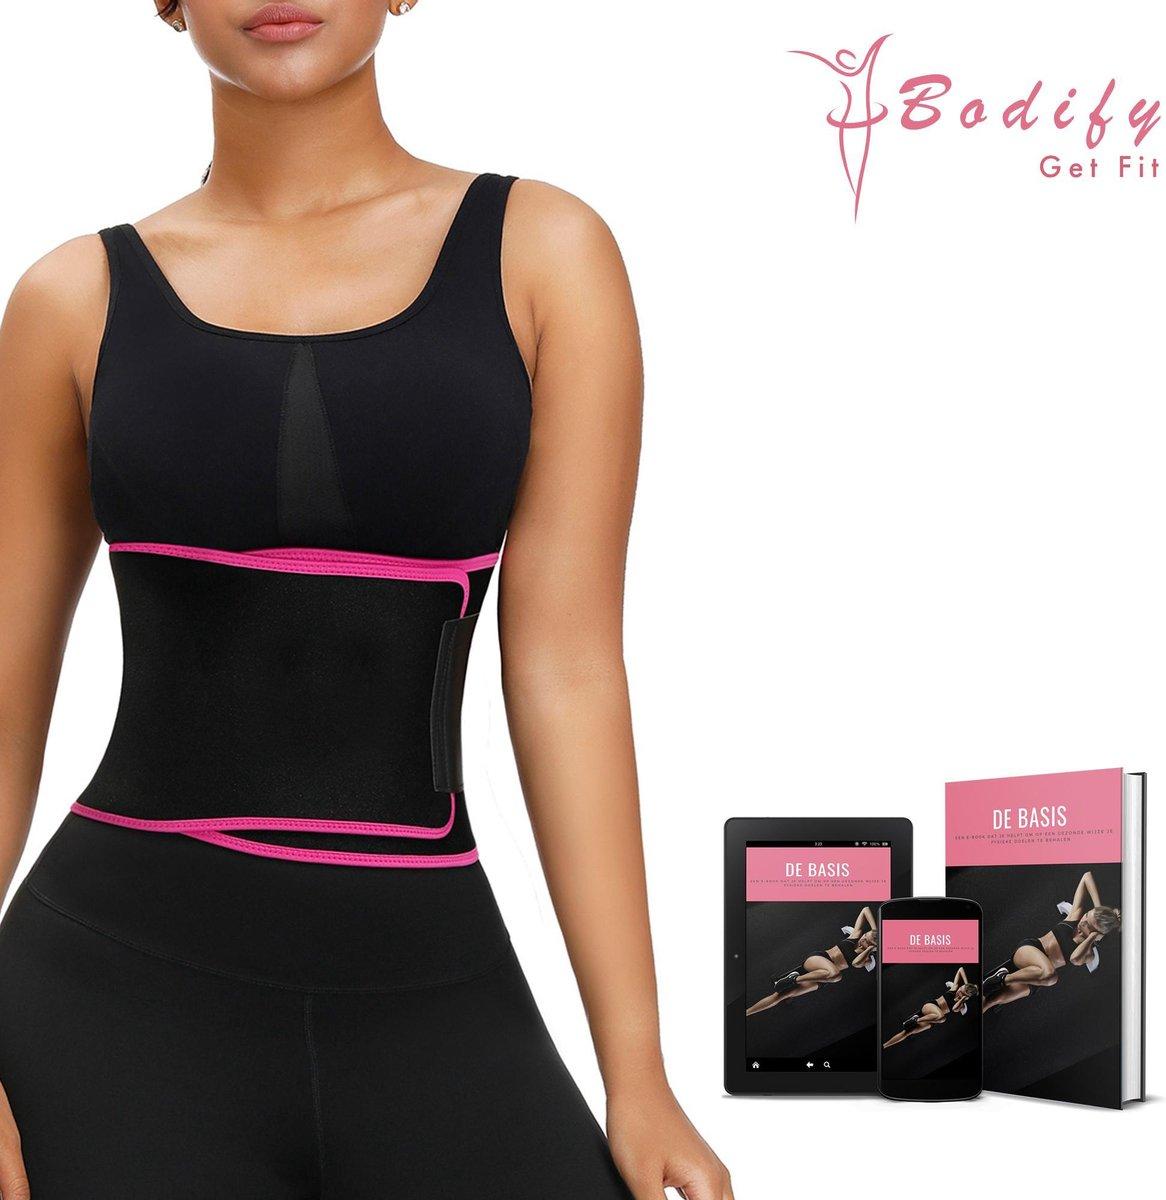 Bodify  Afslankband-Incl. E-Book-Zweetband-Sauna Belt-Sweat Belt-Waist Trainer-Waist Shaper-Shapewea